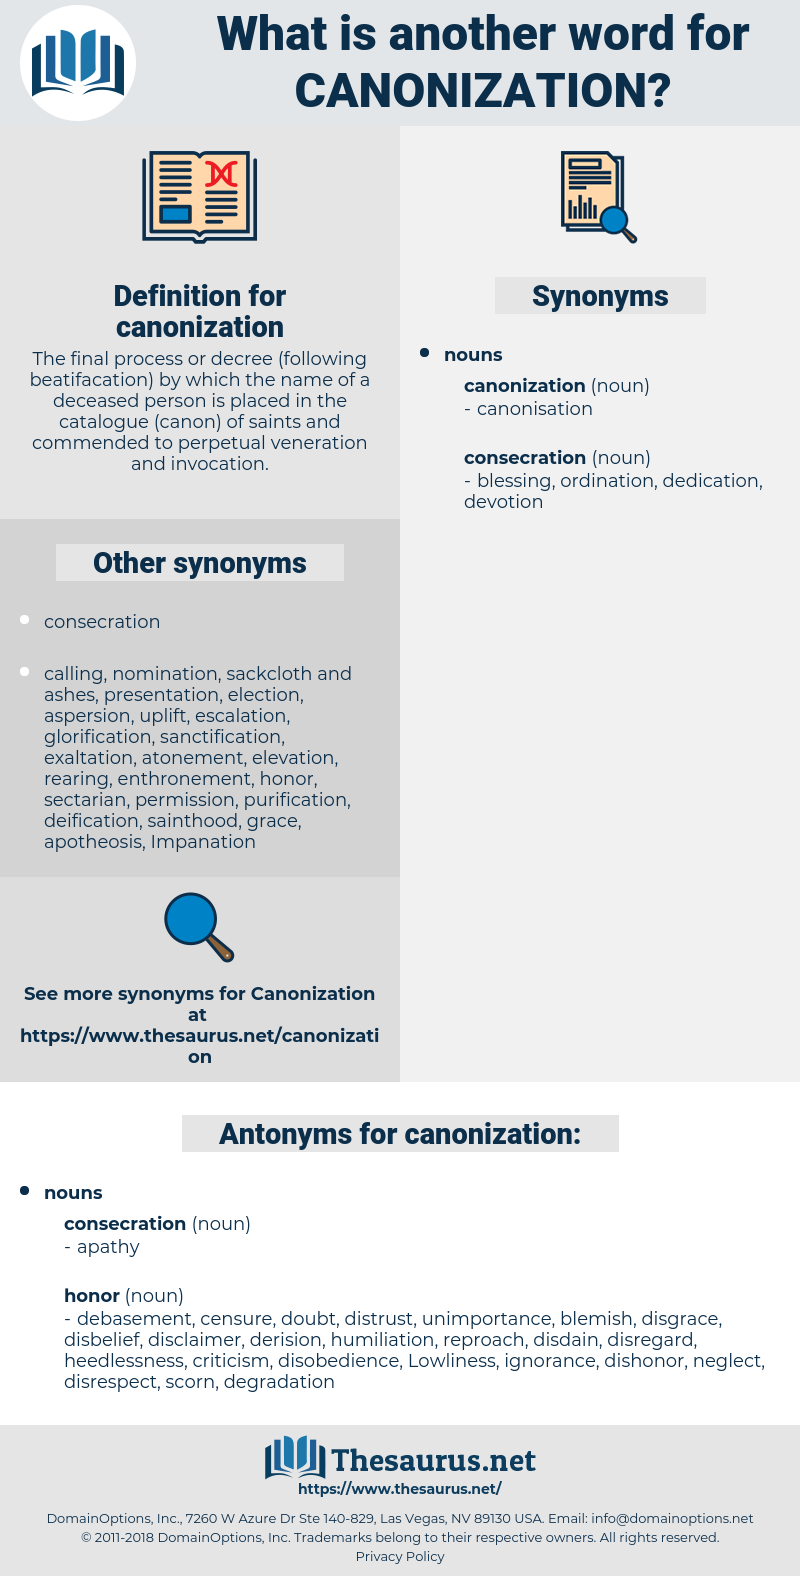 canonization, synonym canonization, another word for canonization, words like canonization, thesaurus canonization